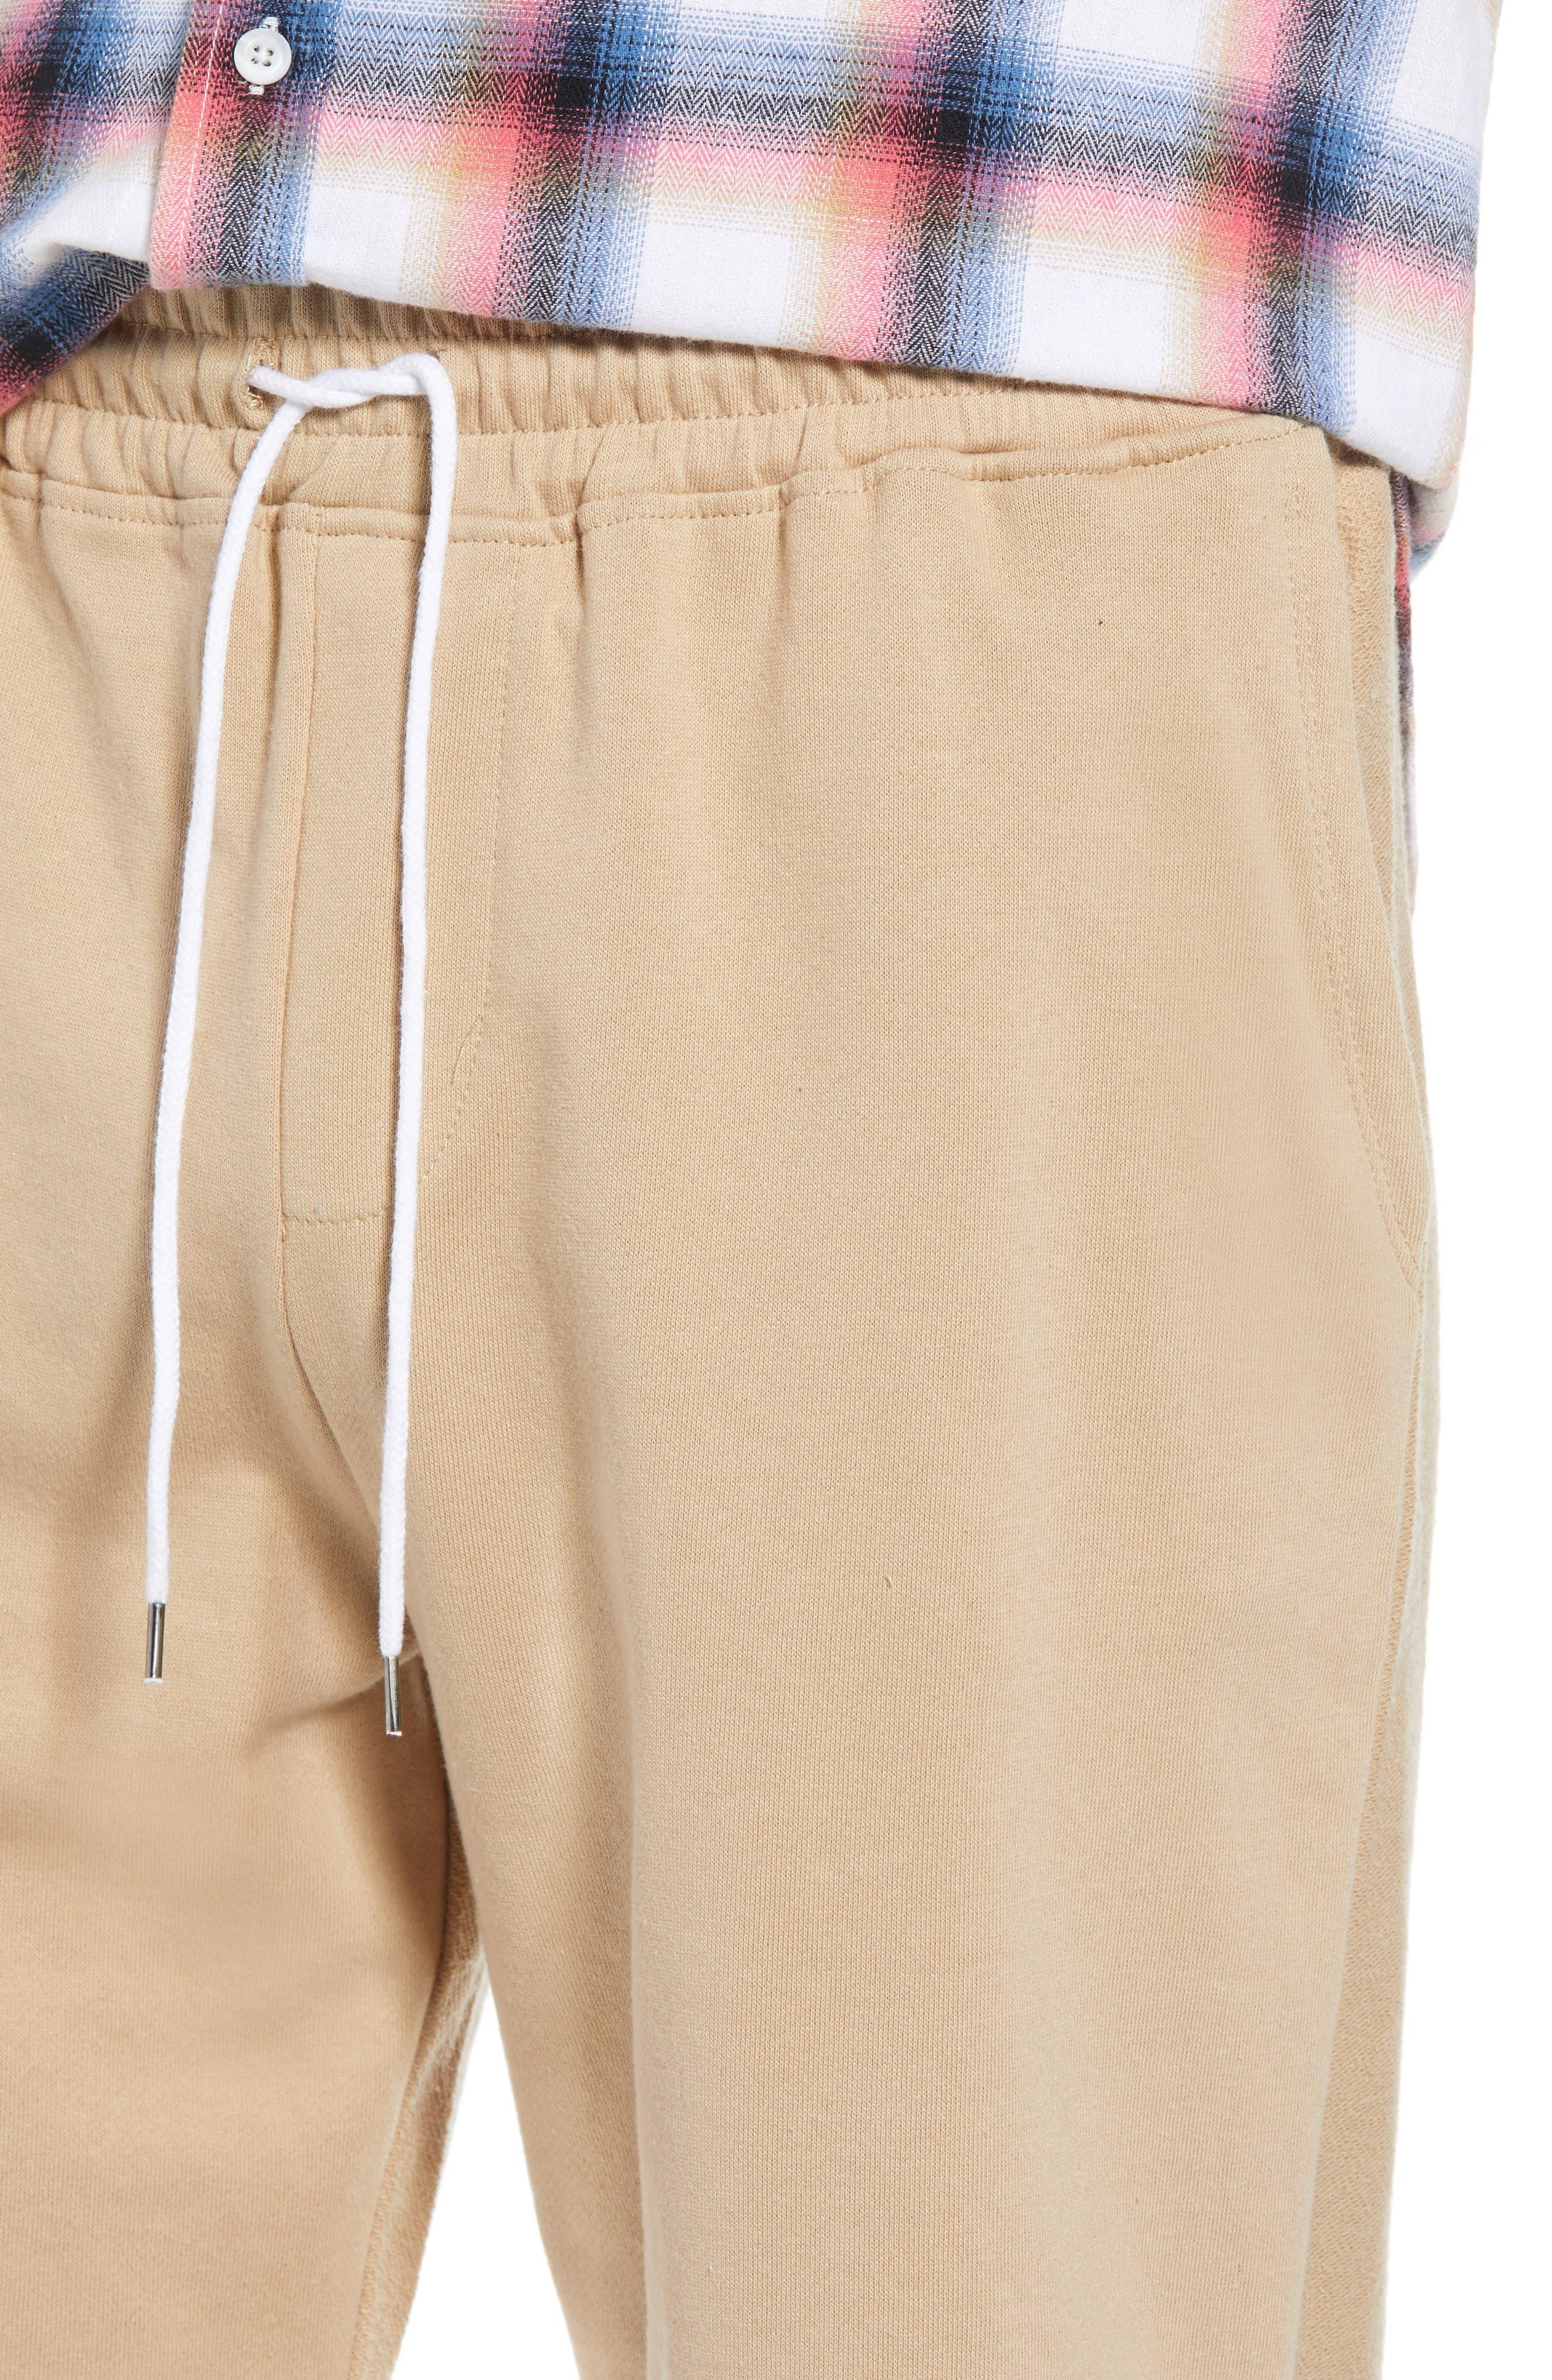 Terry Drawstring Shorts,                             Alternate thumbnail 3, color,                             Tan Safari